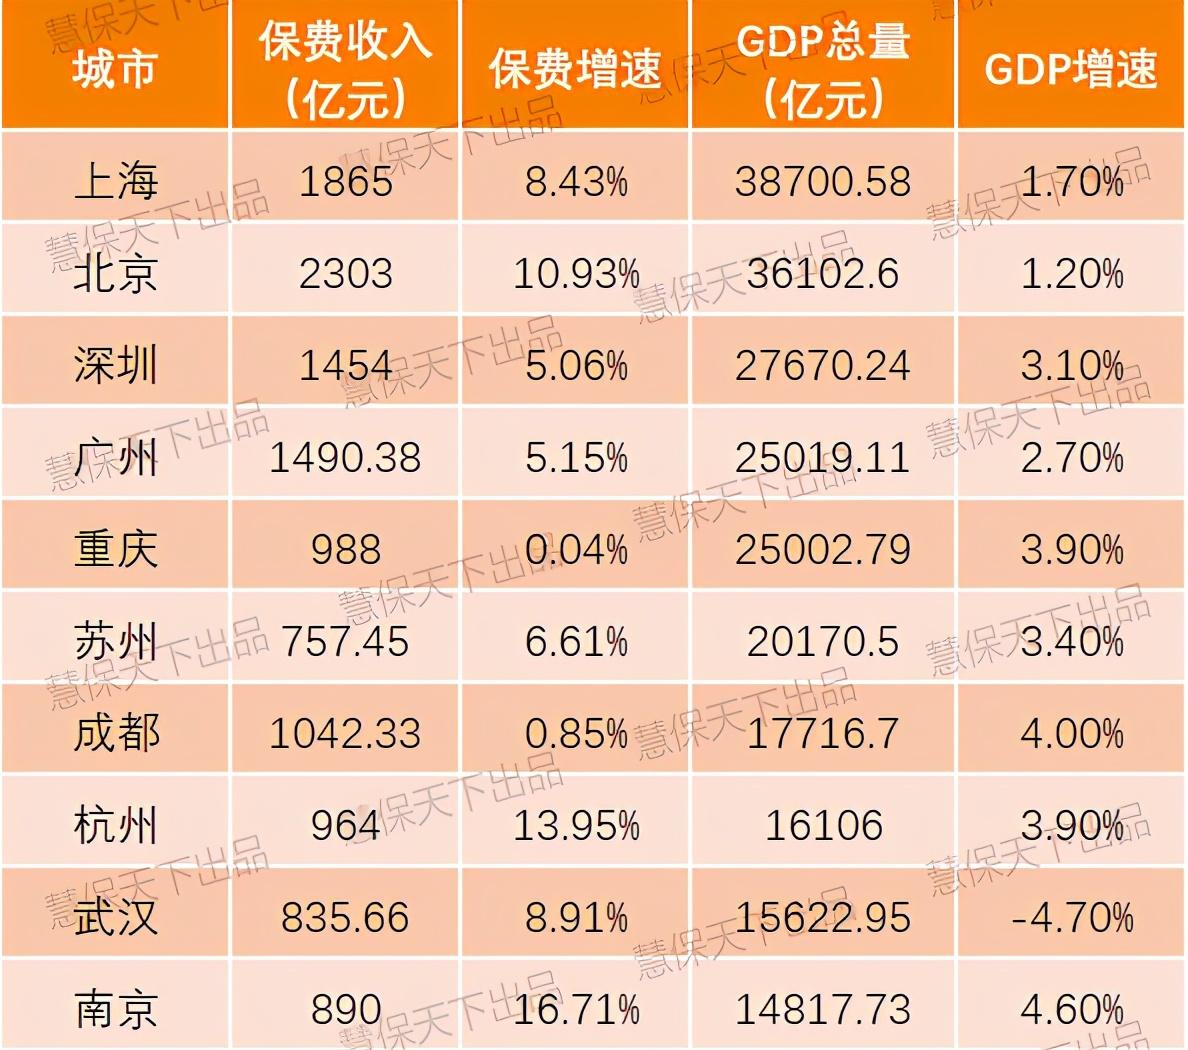 GDP50强城市保费大比拼,哪些城市最有前途